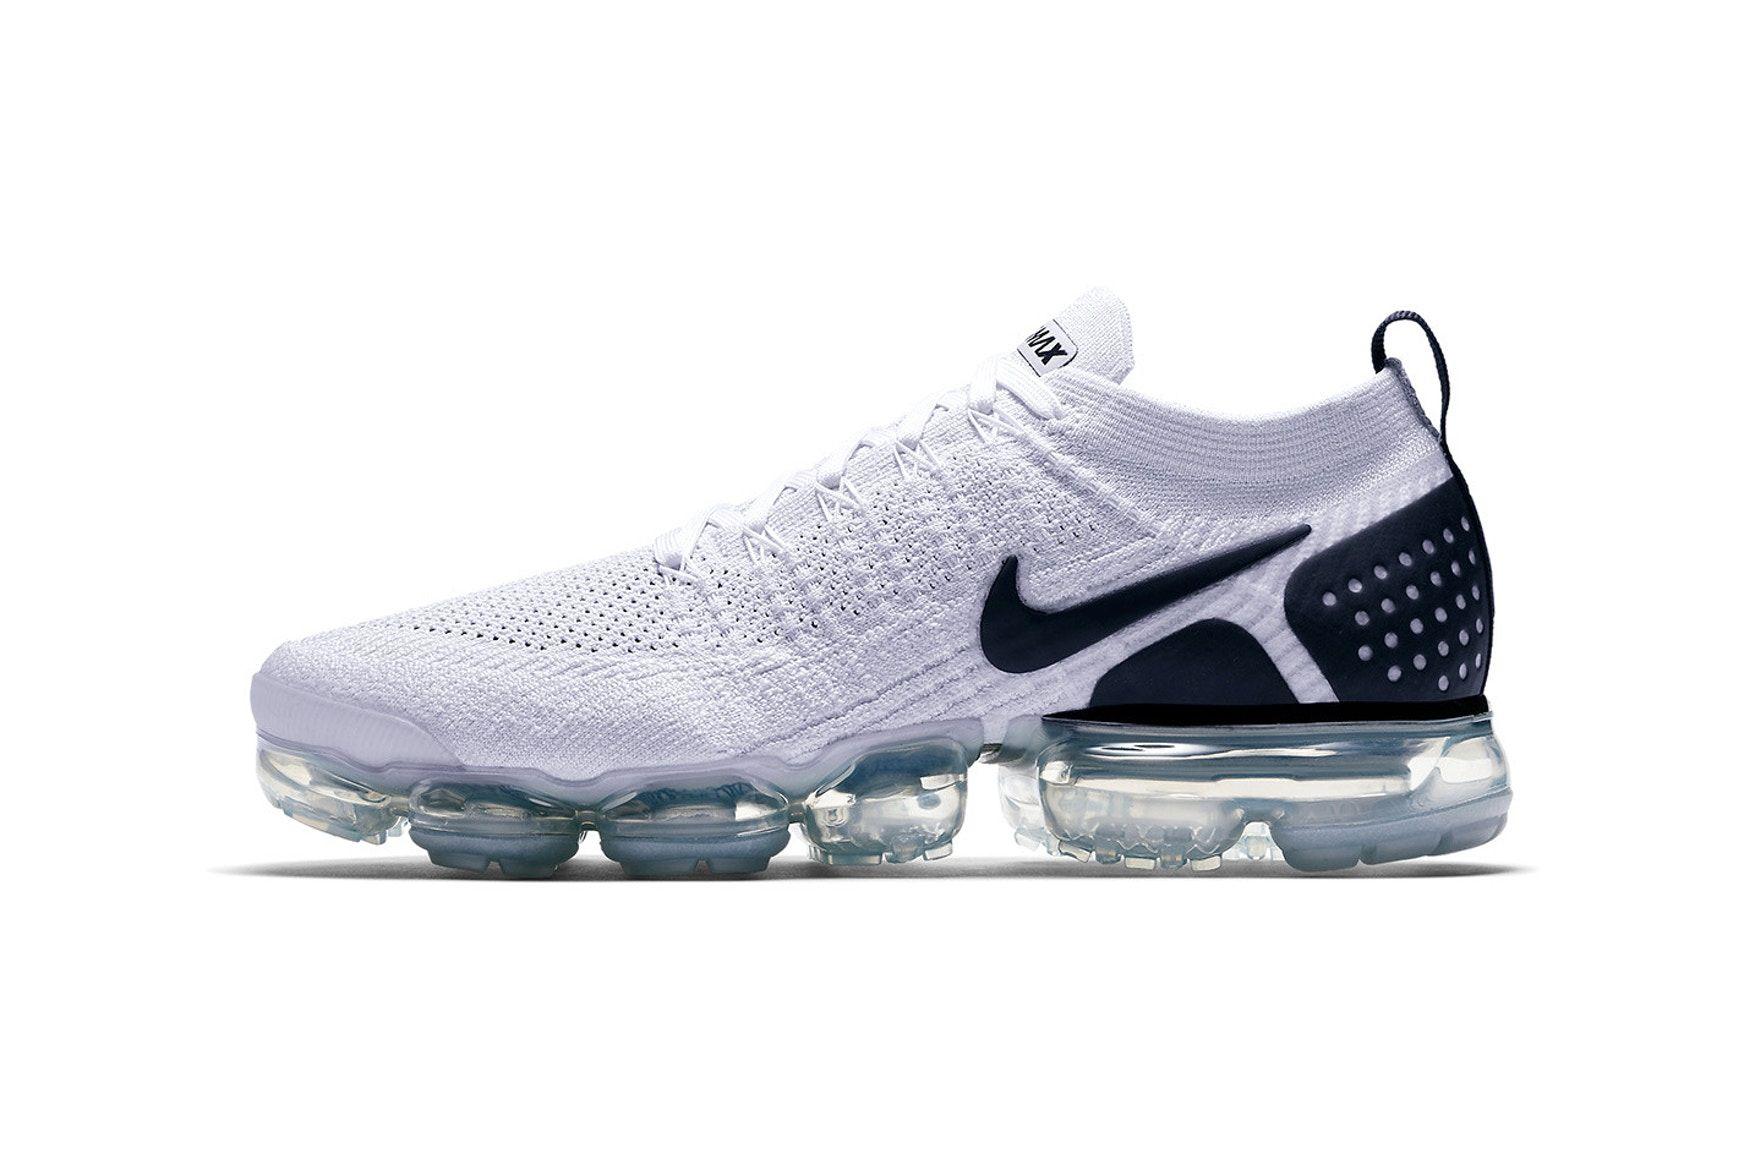 Nike Reveals White Black Reverse Orca Air Vapormax Flyknit 2 0 Sneakers Men Fashion Nike Air Nike Air Vapormax